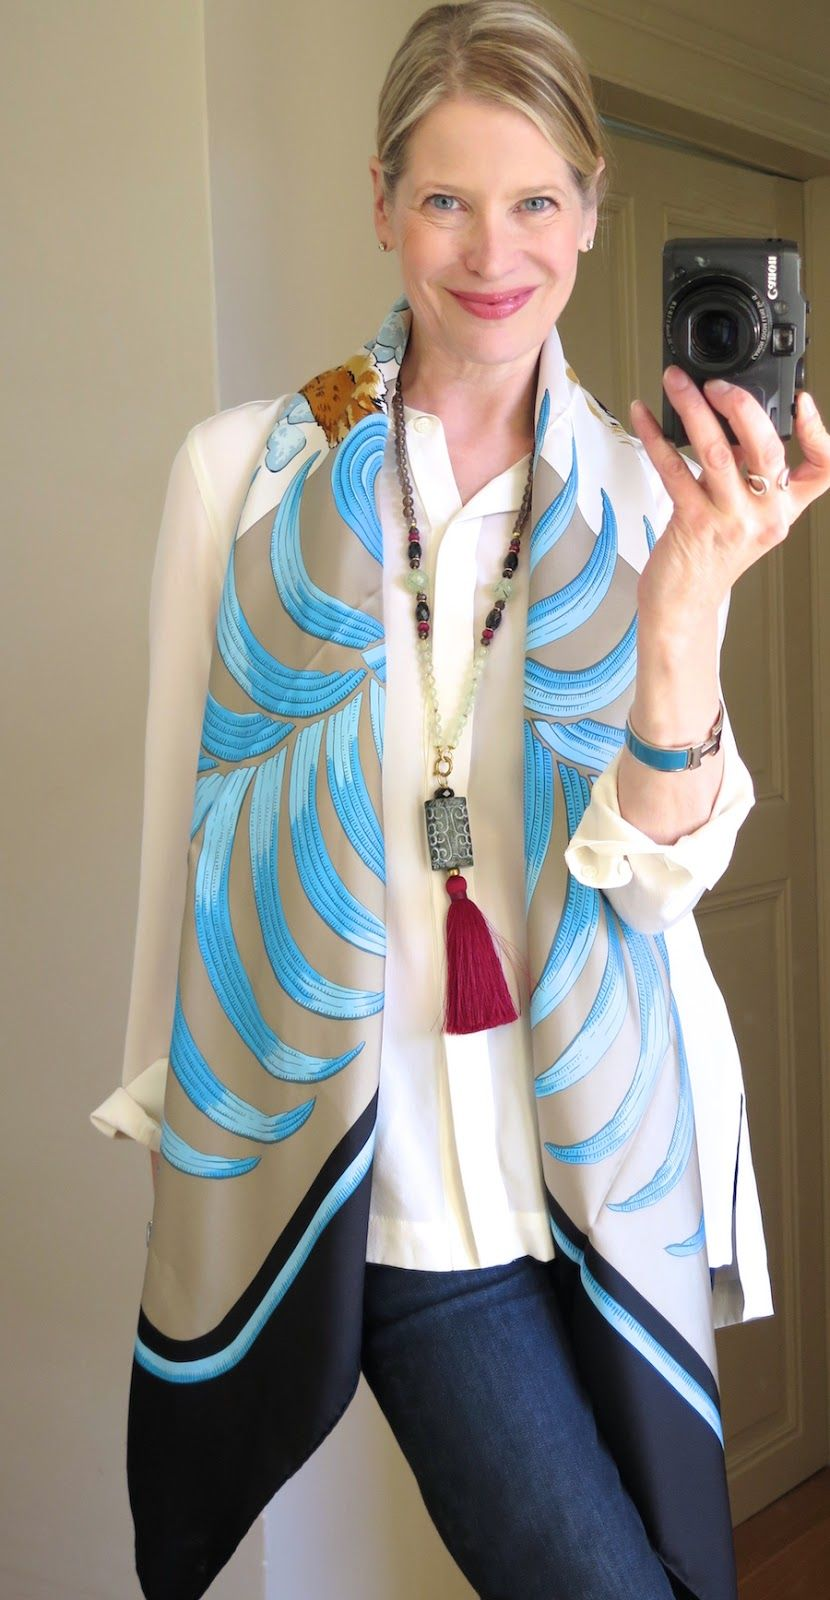 Cashmere Silk Scarf - Natural World Clay by VIDA VIDA wqWK1